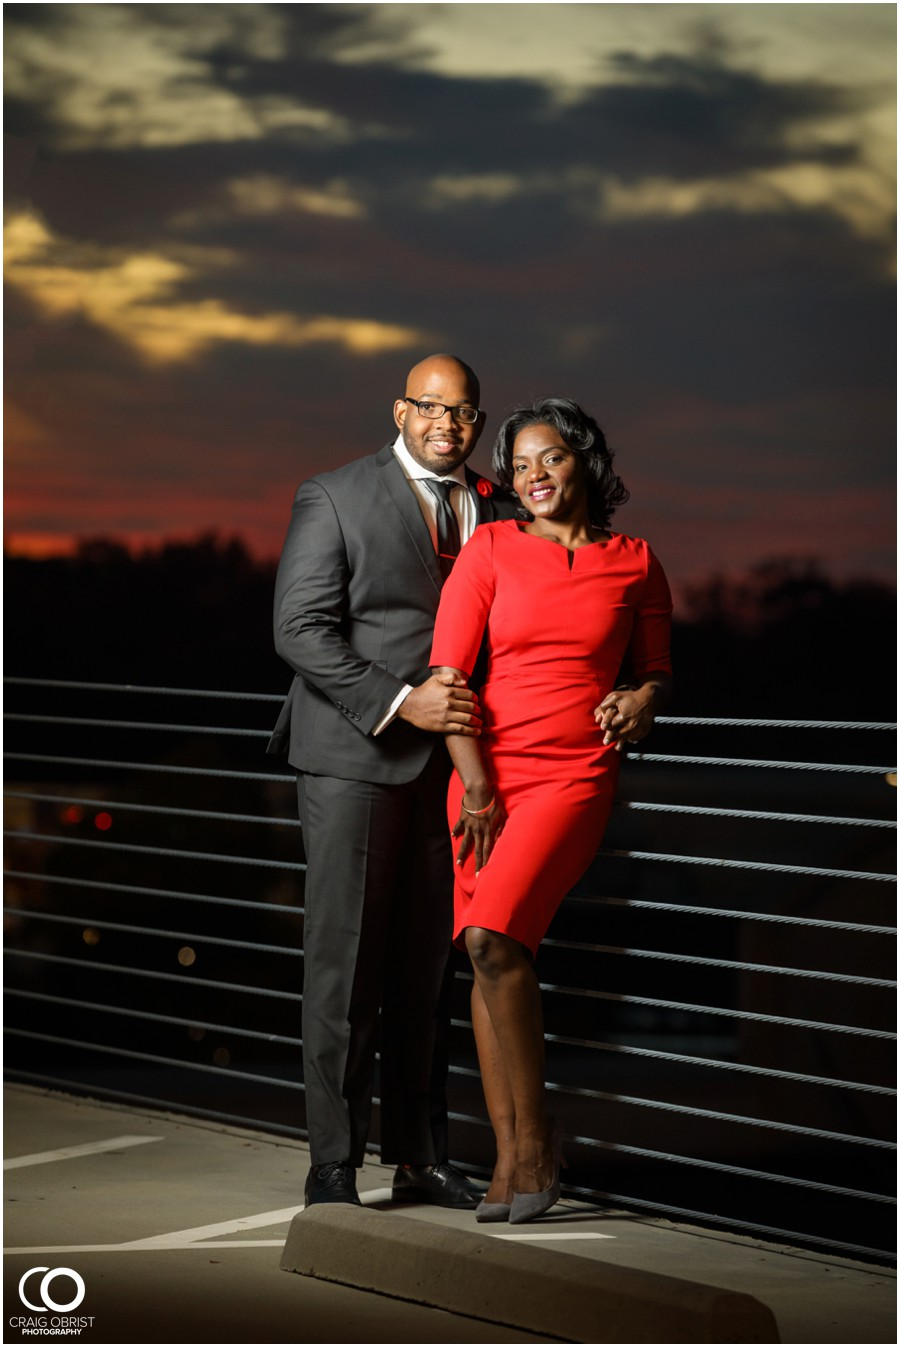 Victory World Church Atlanta Engagement Portraits Buckhead_0014.jpg